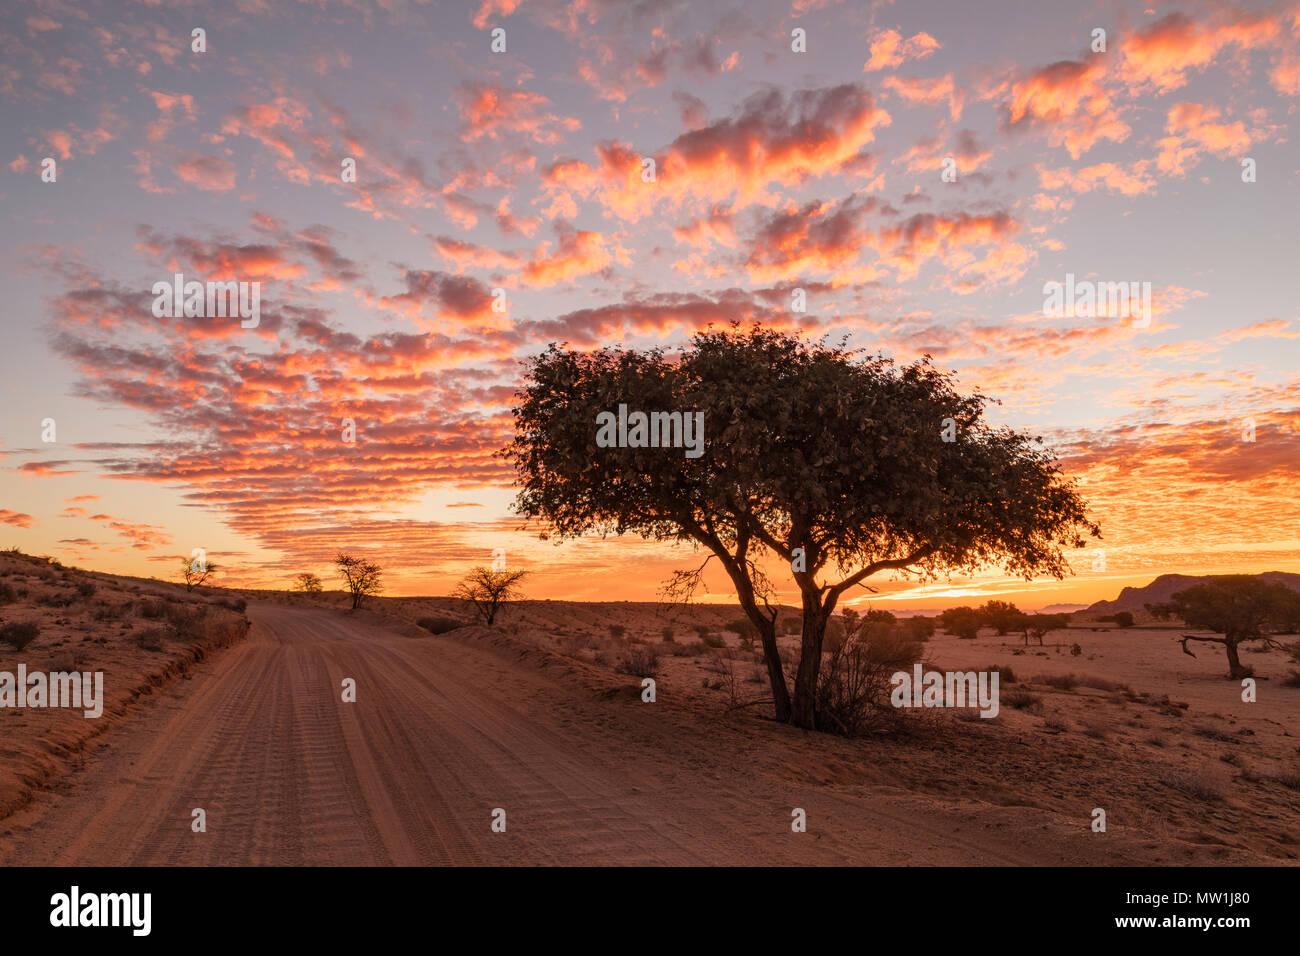 Aus, Namibia, Africa Immagini Stock